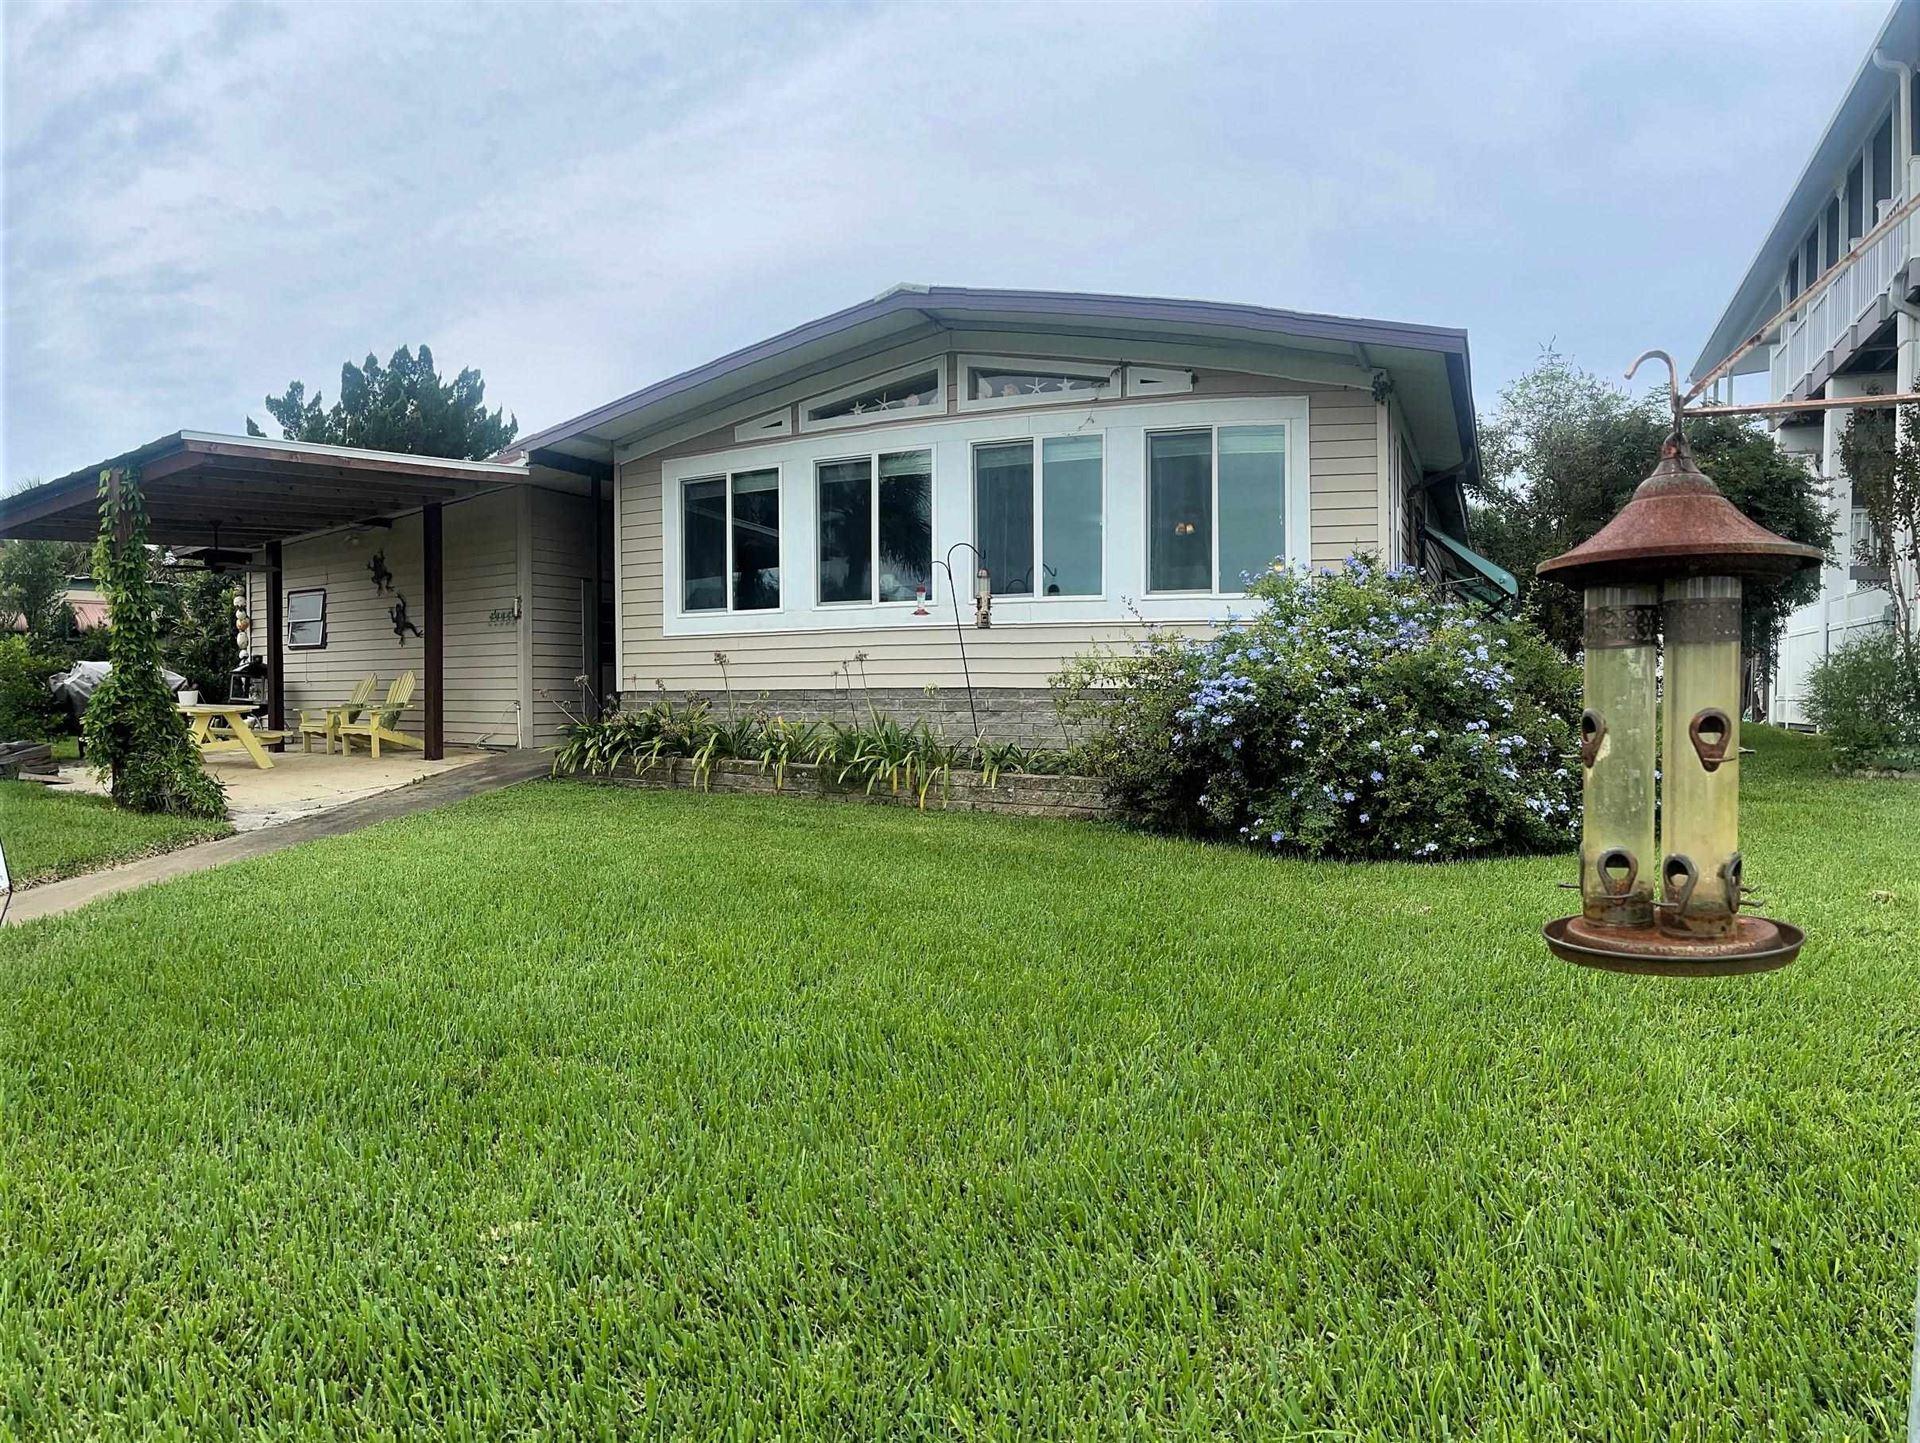 40 Connie Drive, Crawfordville, FL 32327 - MLS#: 337017